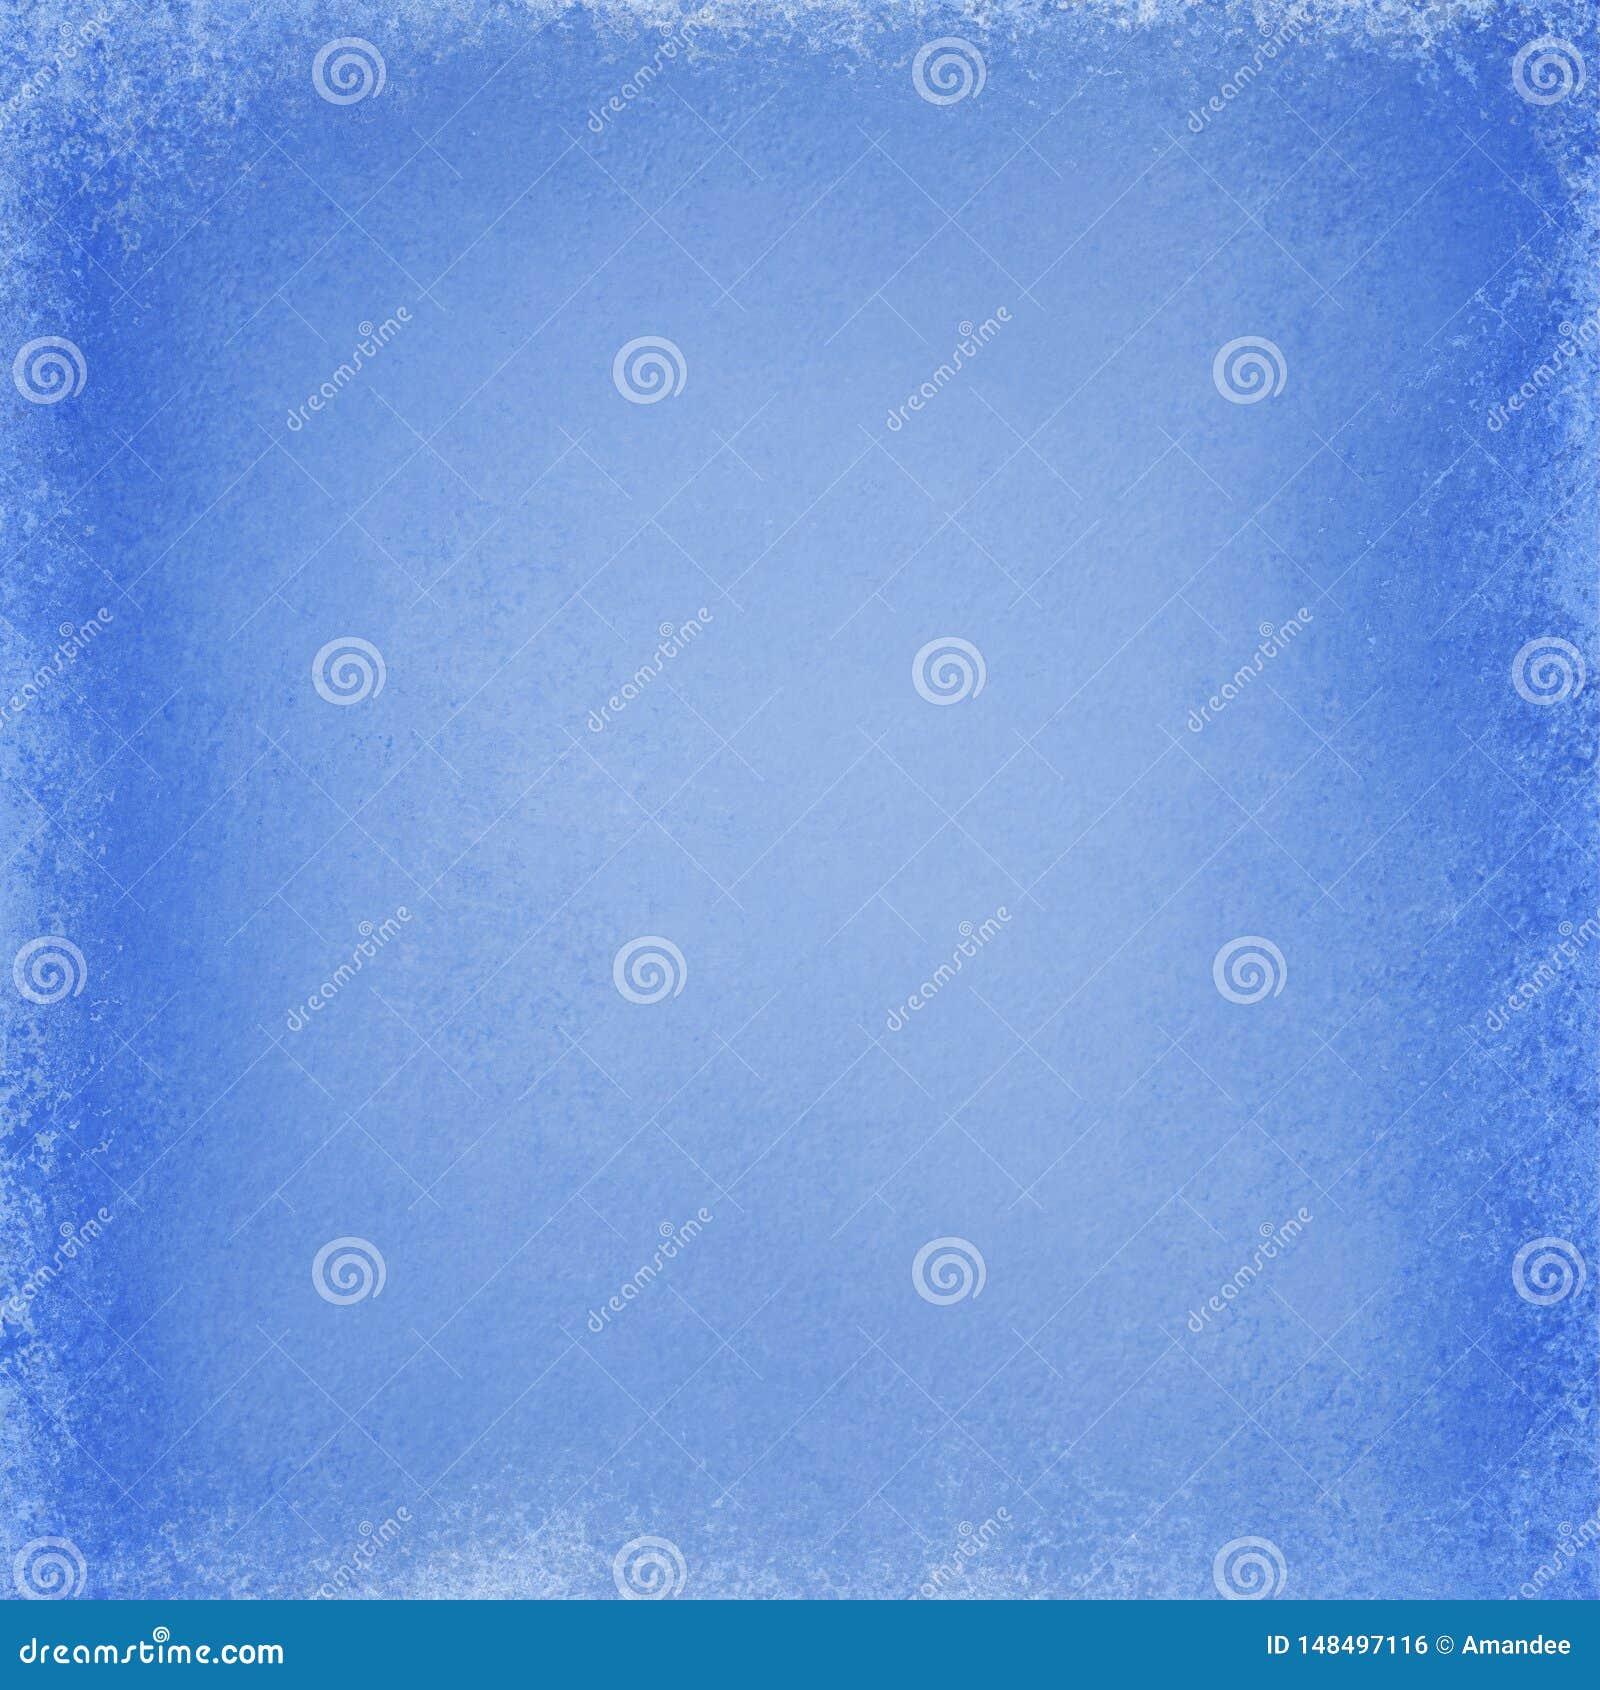 Blue background with dark blue texture and grunge border design, elegant old blank paper illustration